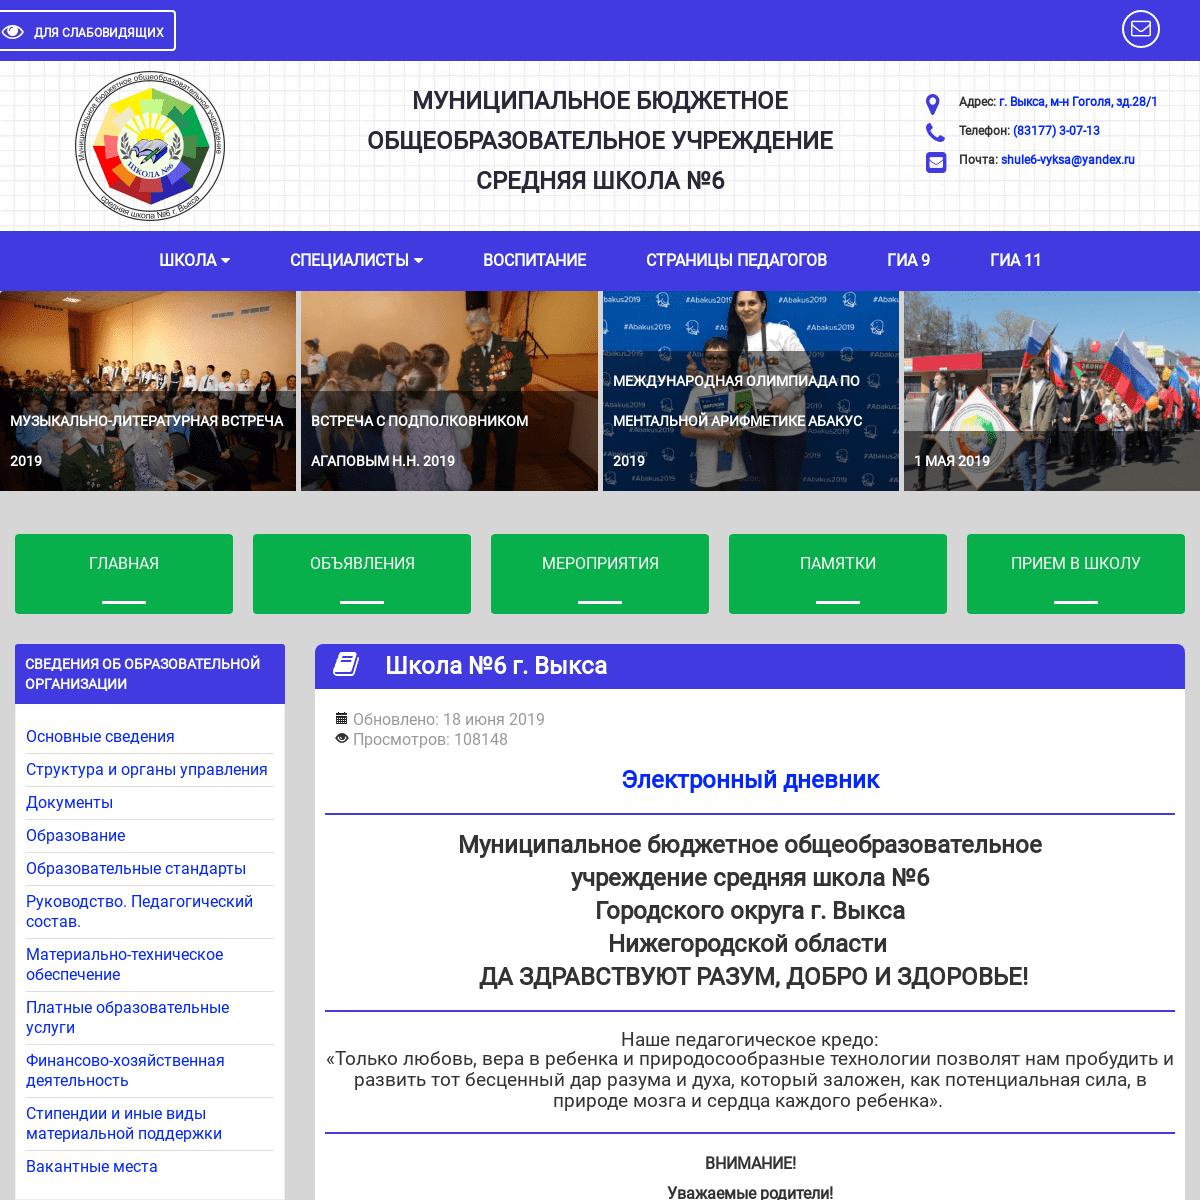 ArchiveBay.com - shkola6-vyksa.ru - Школа №6 г. Выкса - Главная